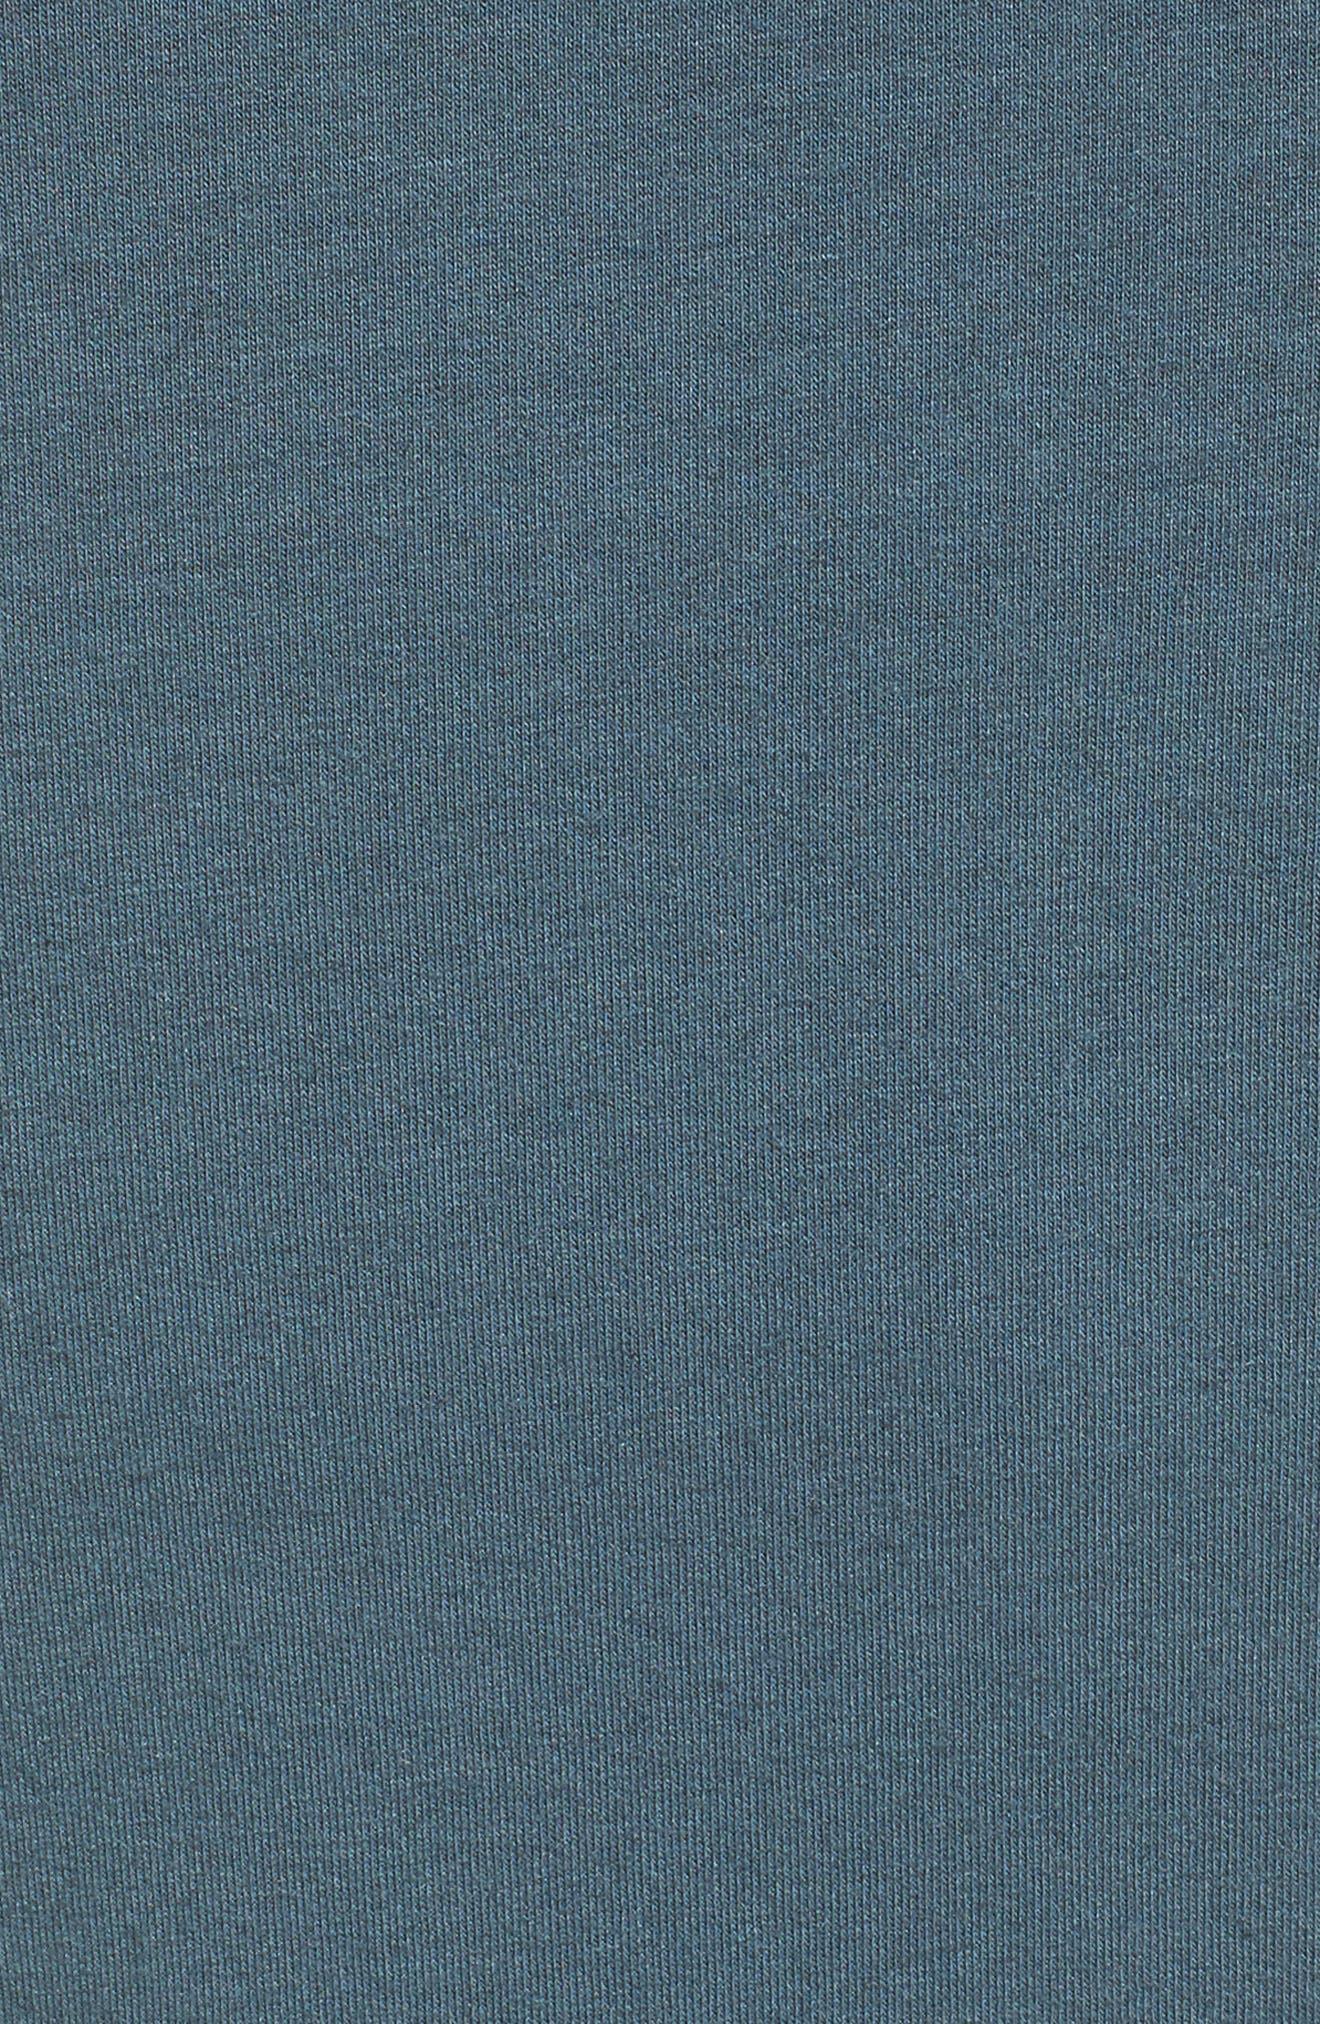 May Contain Wine Sweatshirt,                             Alternate thumbnail 6, color,                             Gunmetal